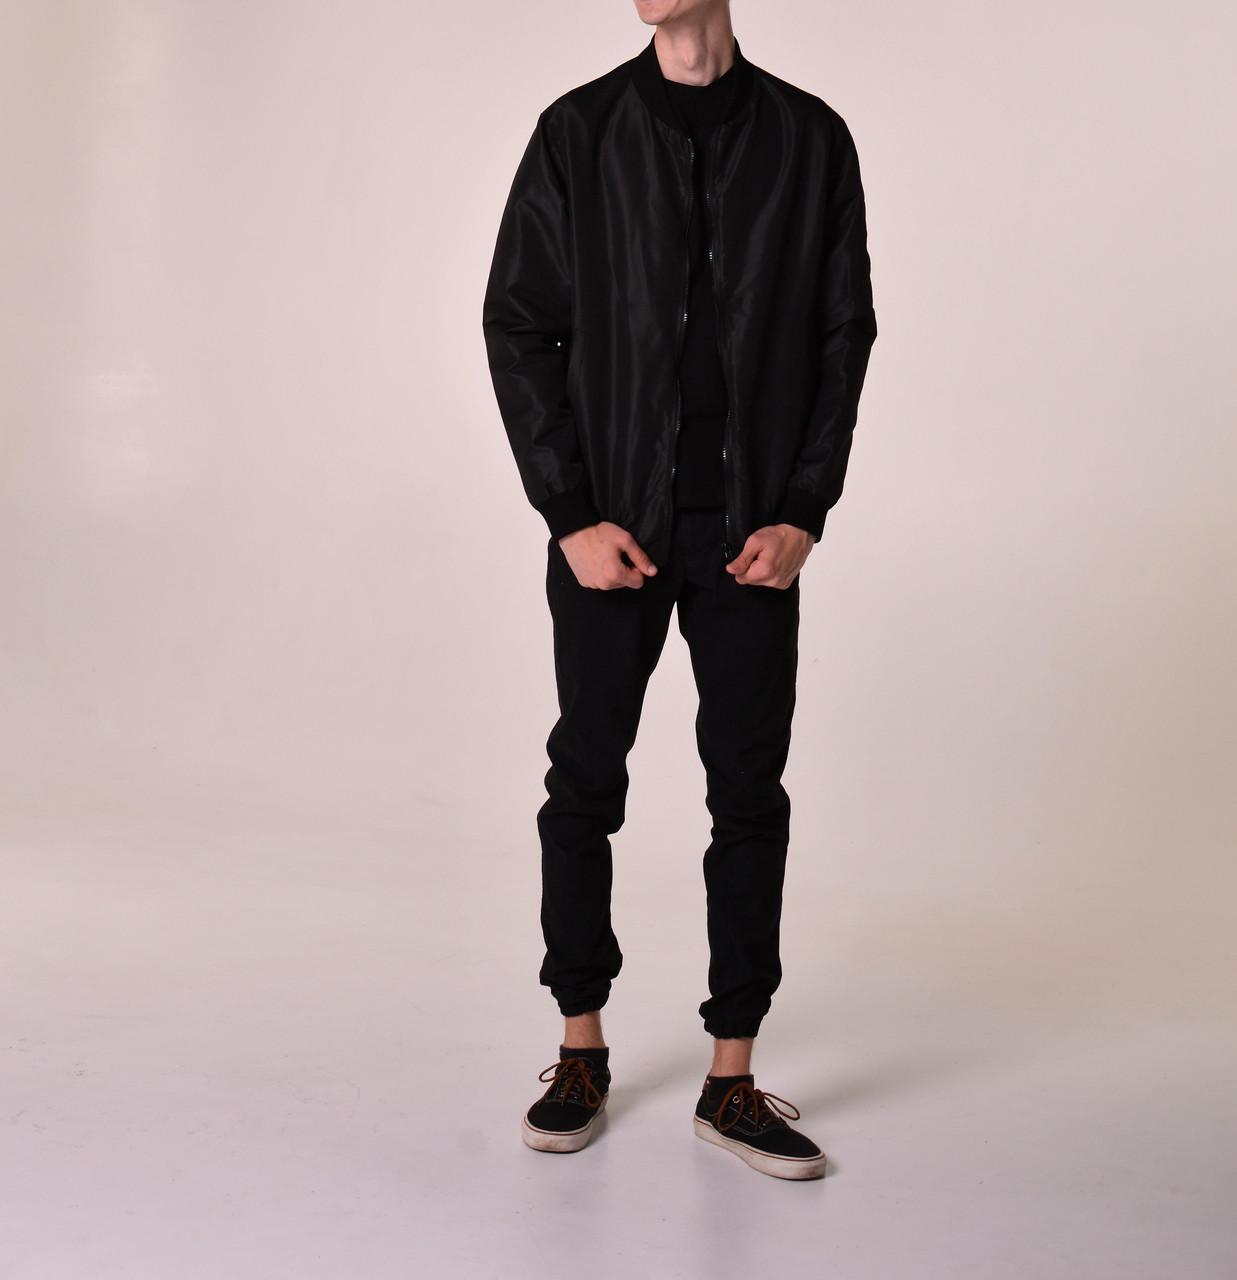 Бомбер мужской   куртка осенняя   весенняя черный  продажа ada681ed3d2d6